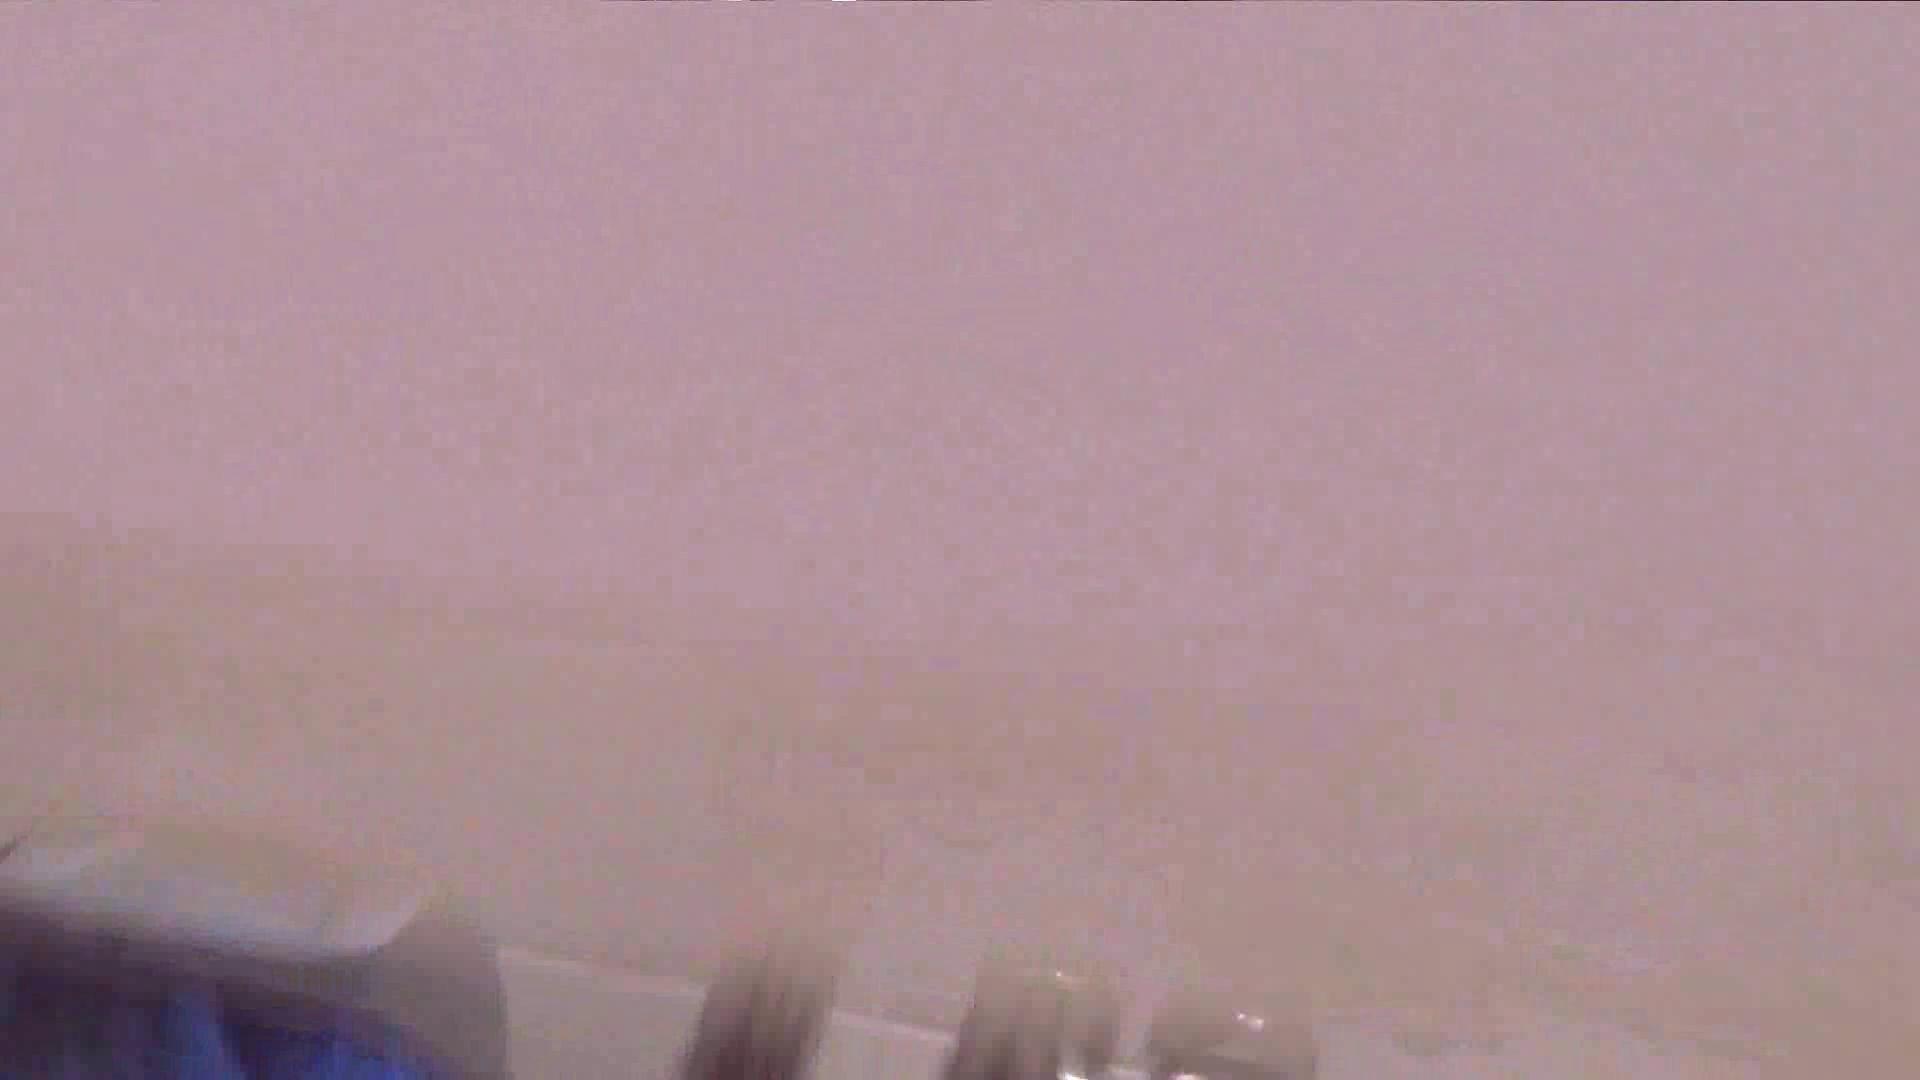 vol.17 命がけ潜伏洗面所! 張り裂けんばかりの大物 プライベート 盗撮ワレメ無修正動画無料 108画像 51